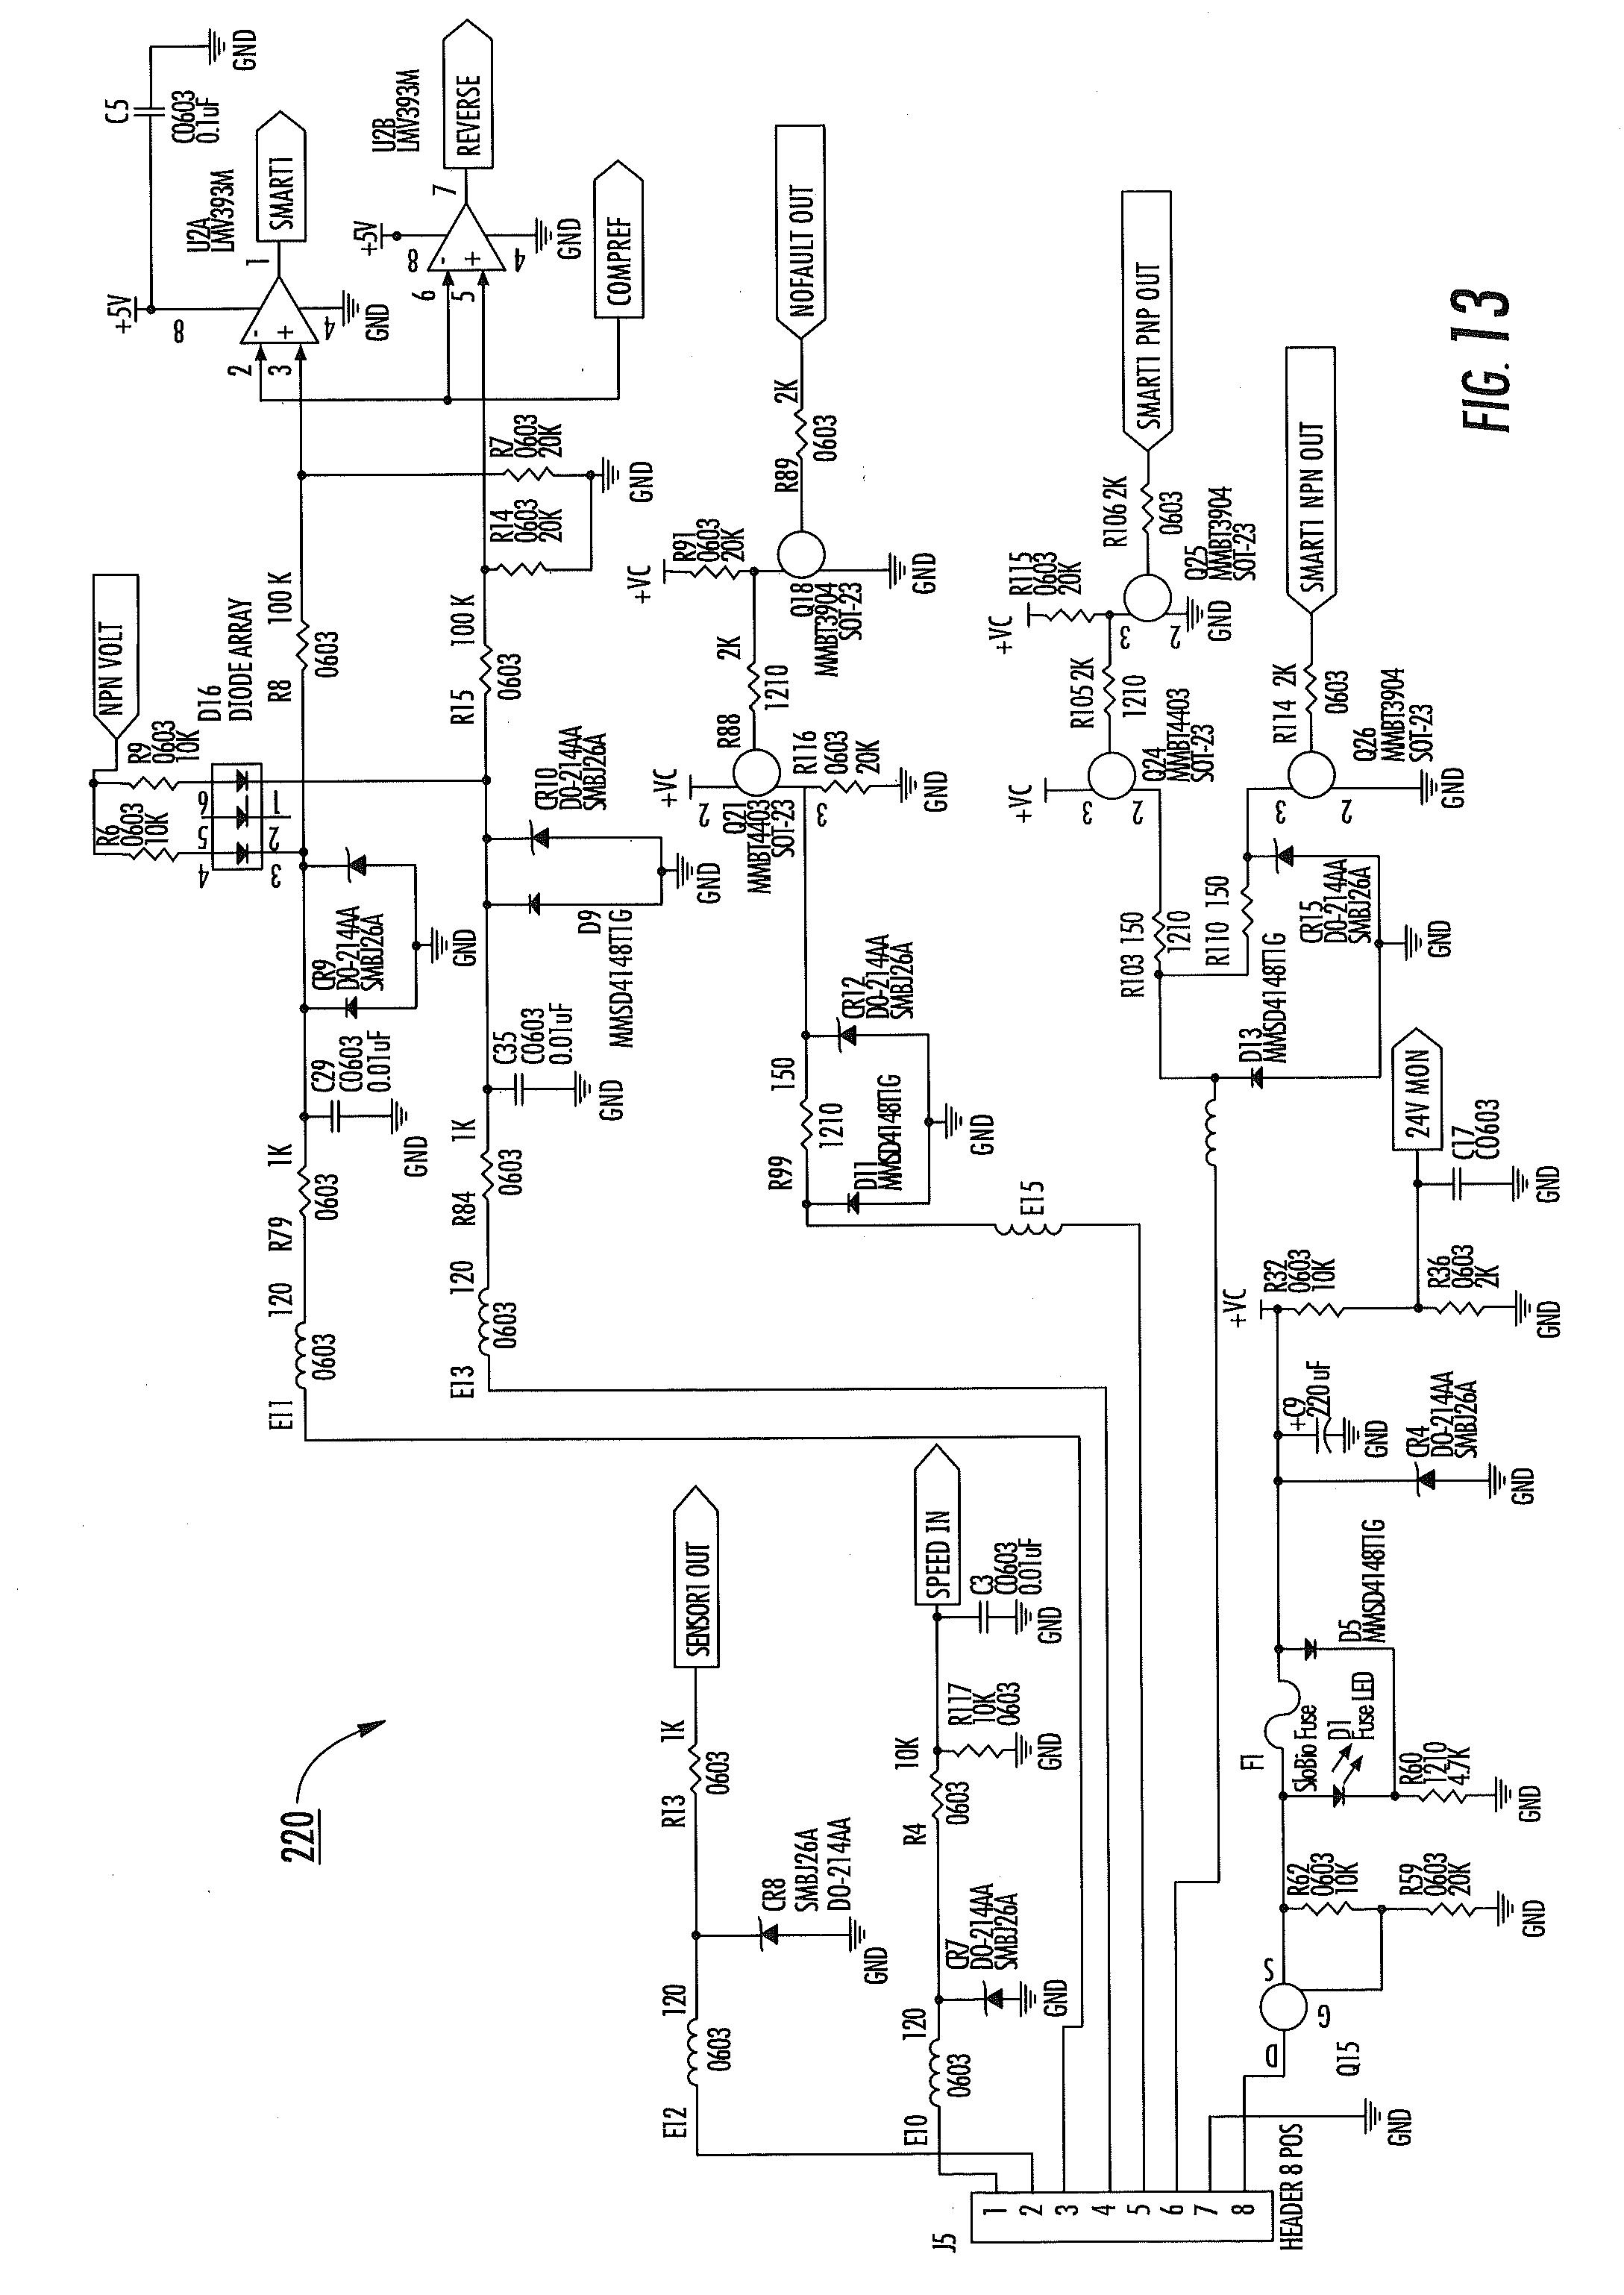 wiring diagram one motor conveyor block diagram wiring